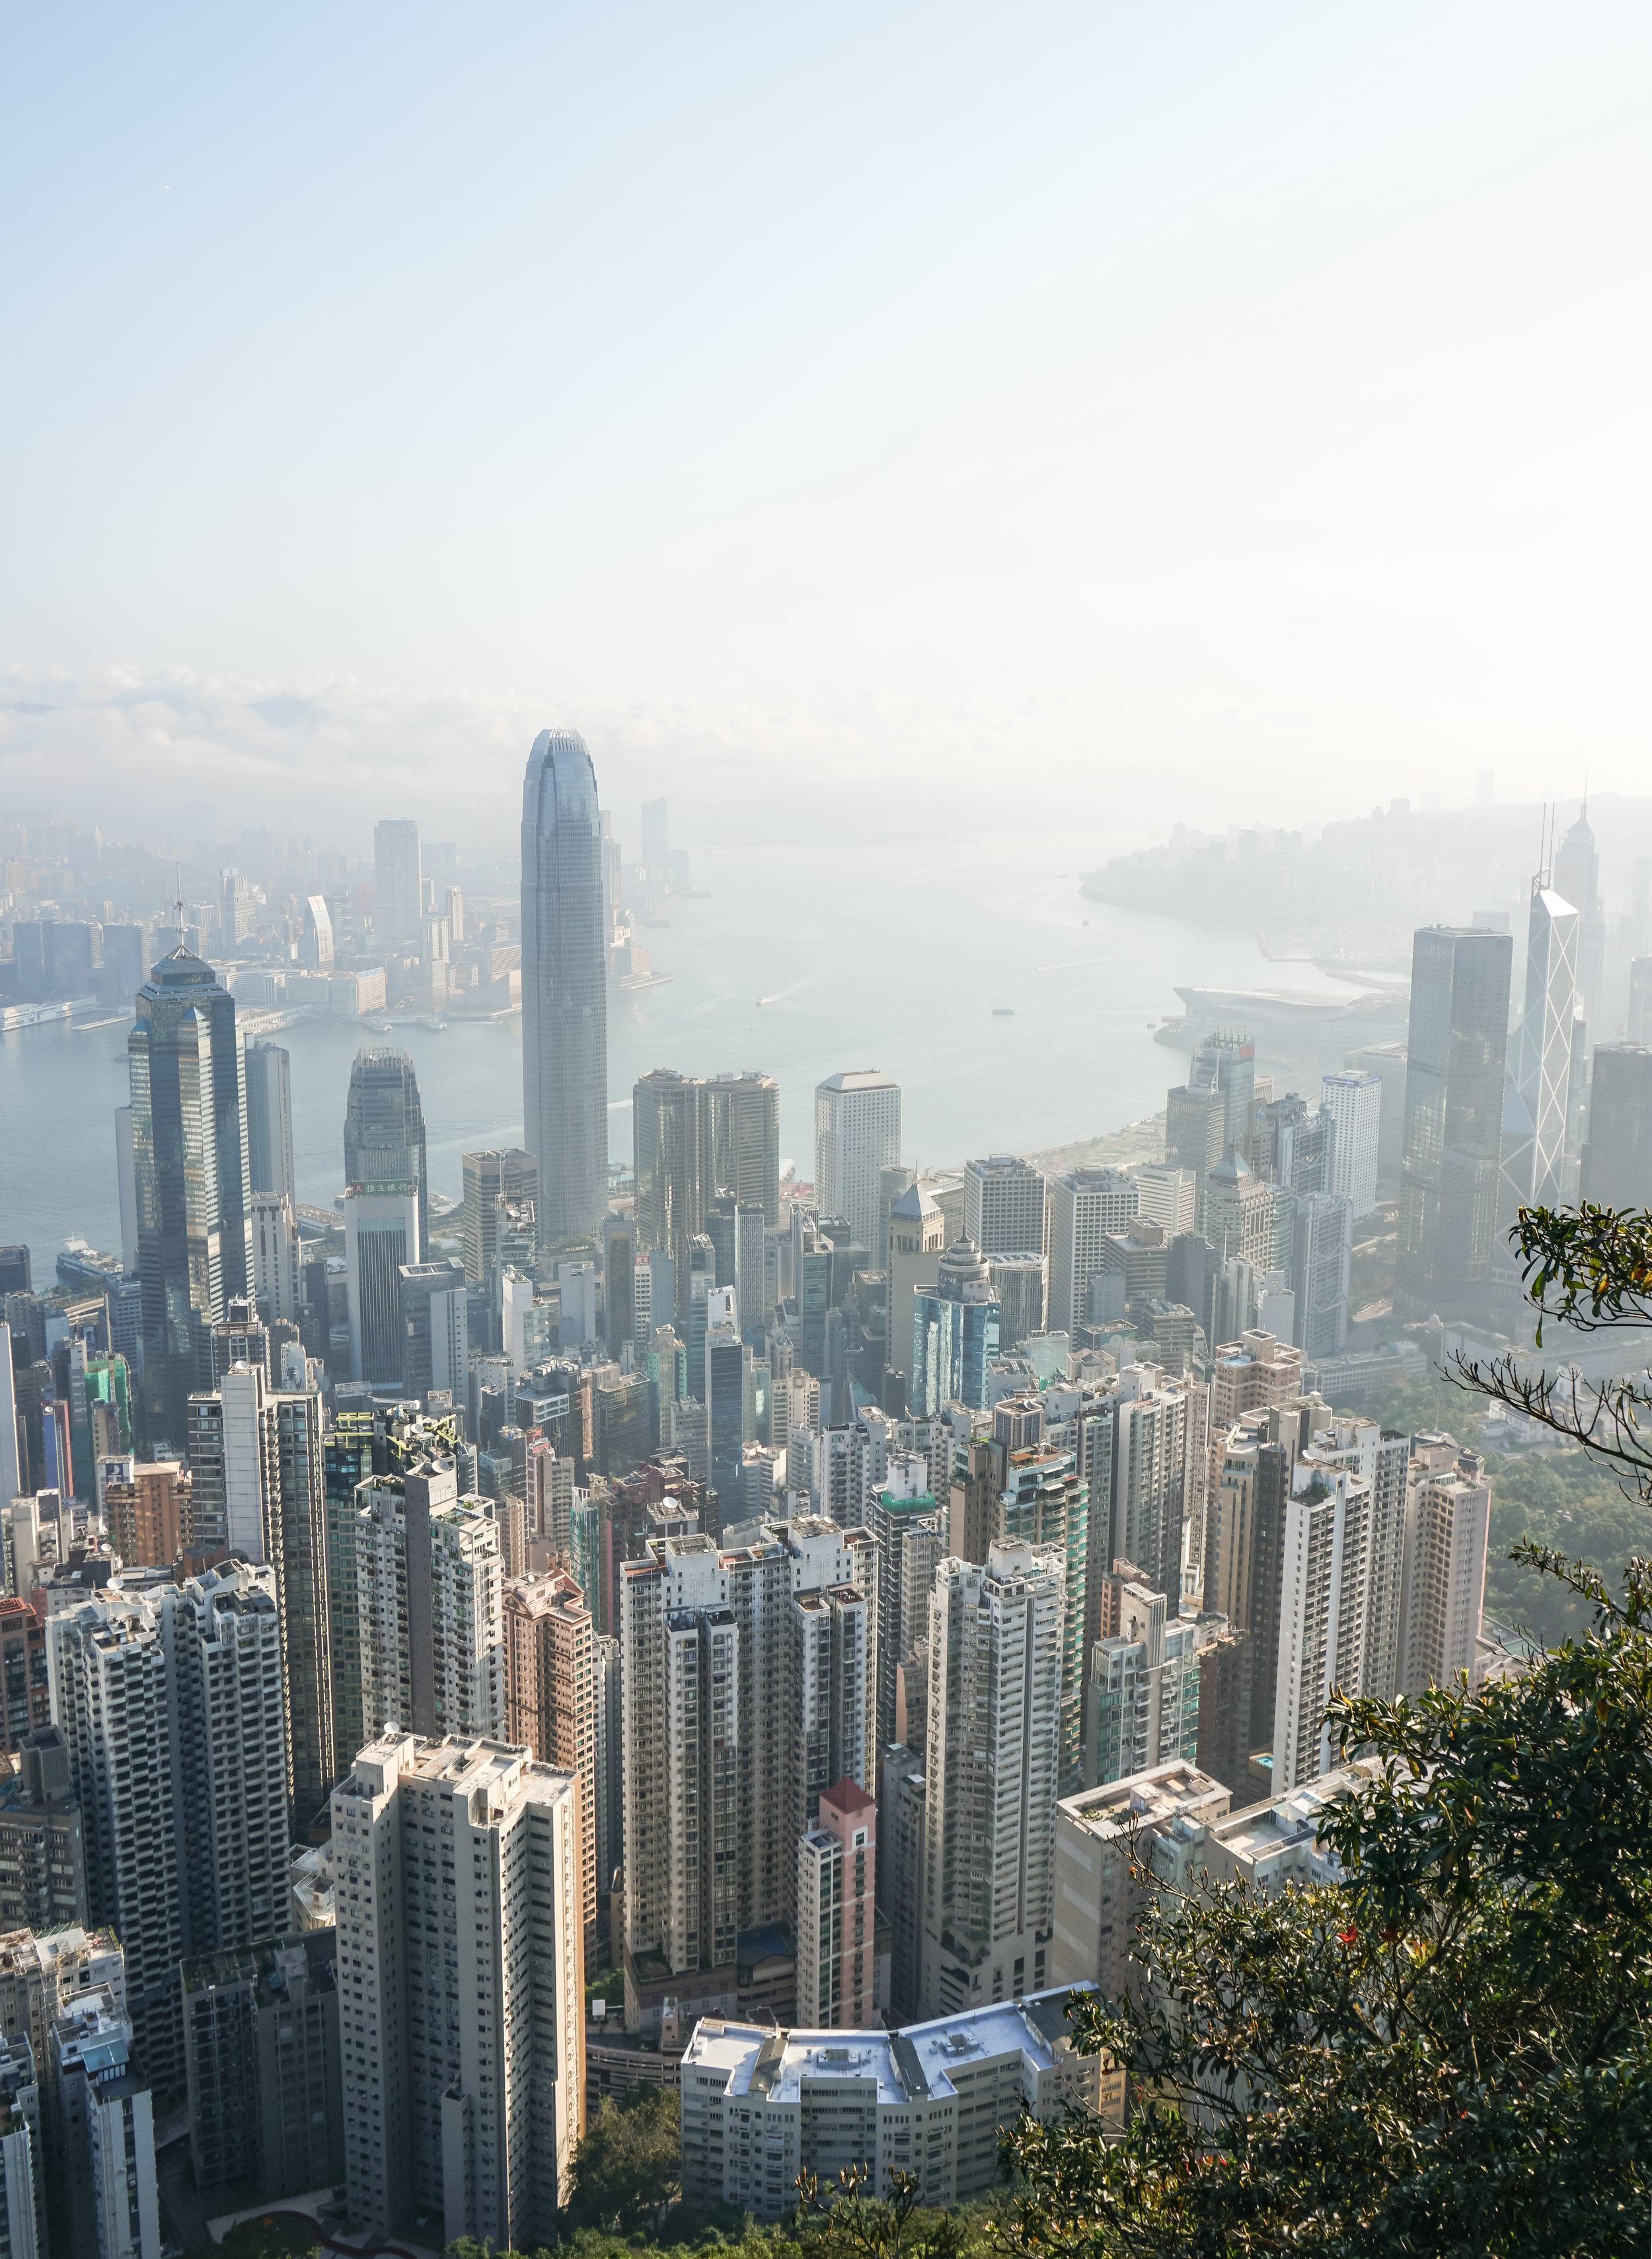 curio.trips.hong.kong.peak.cityscape.portrait.jpg